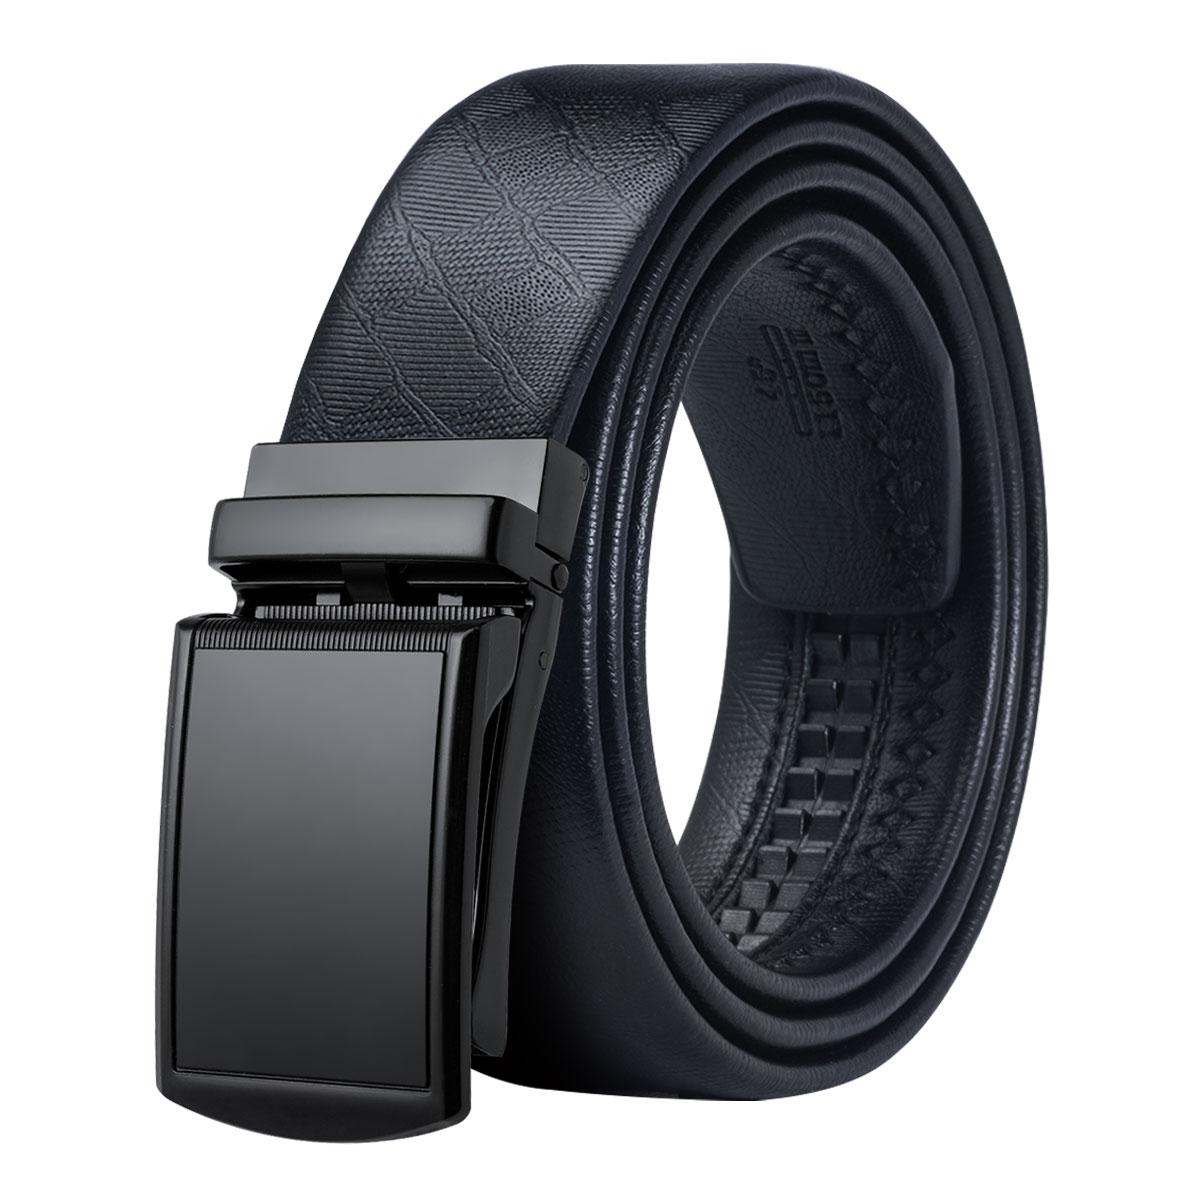 DiBanGu Brand Automatic Buckle Luxury Leather Belts for Men Formal Suit 110-150cm long Men's Luxury Belt Gift Box Set CK-002